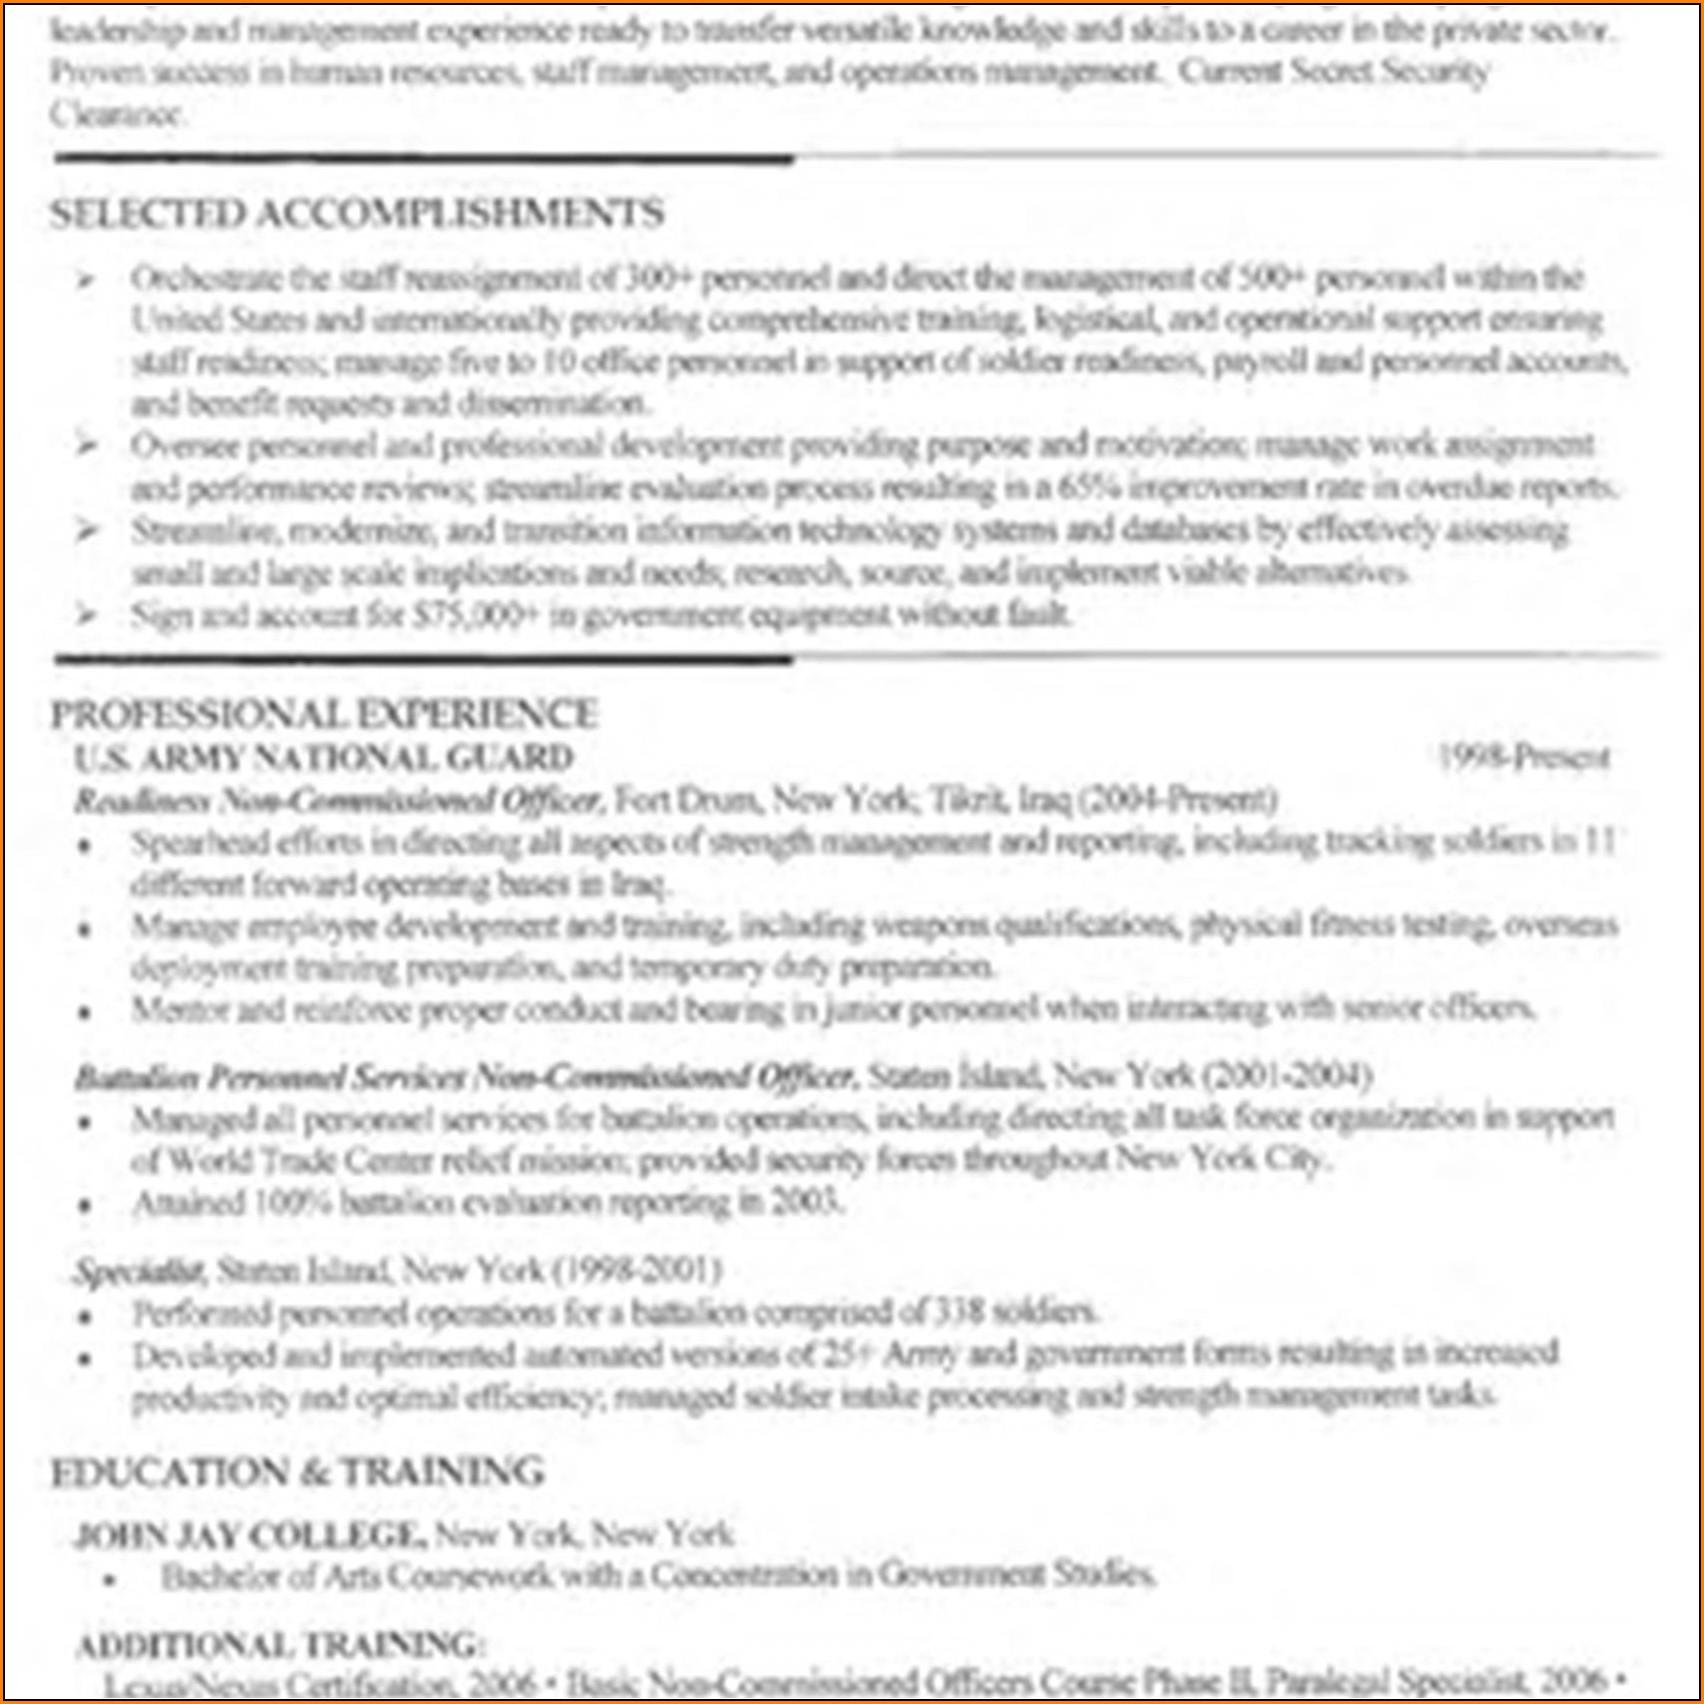 resume writing service reviews 2018